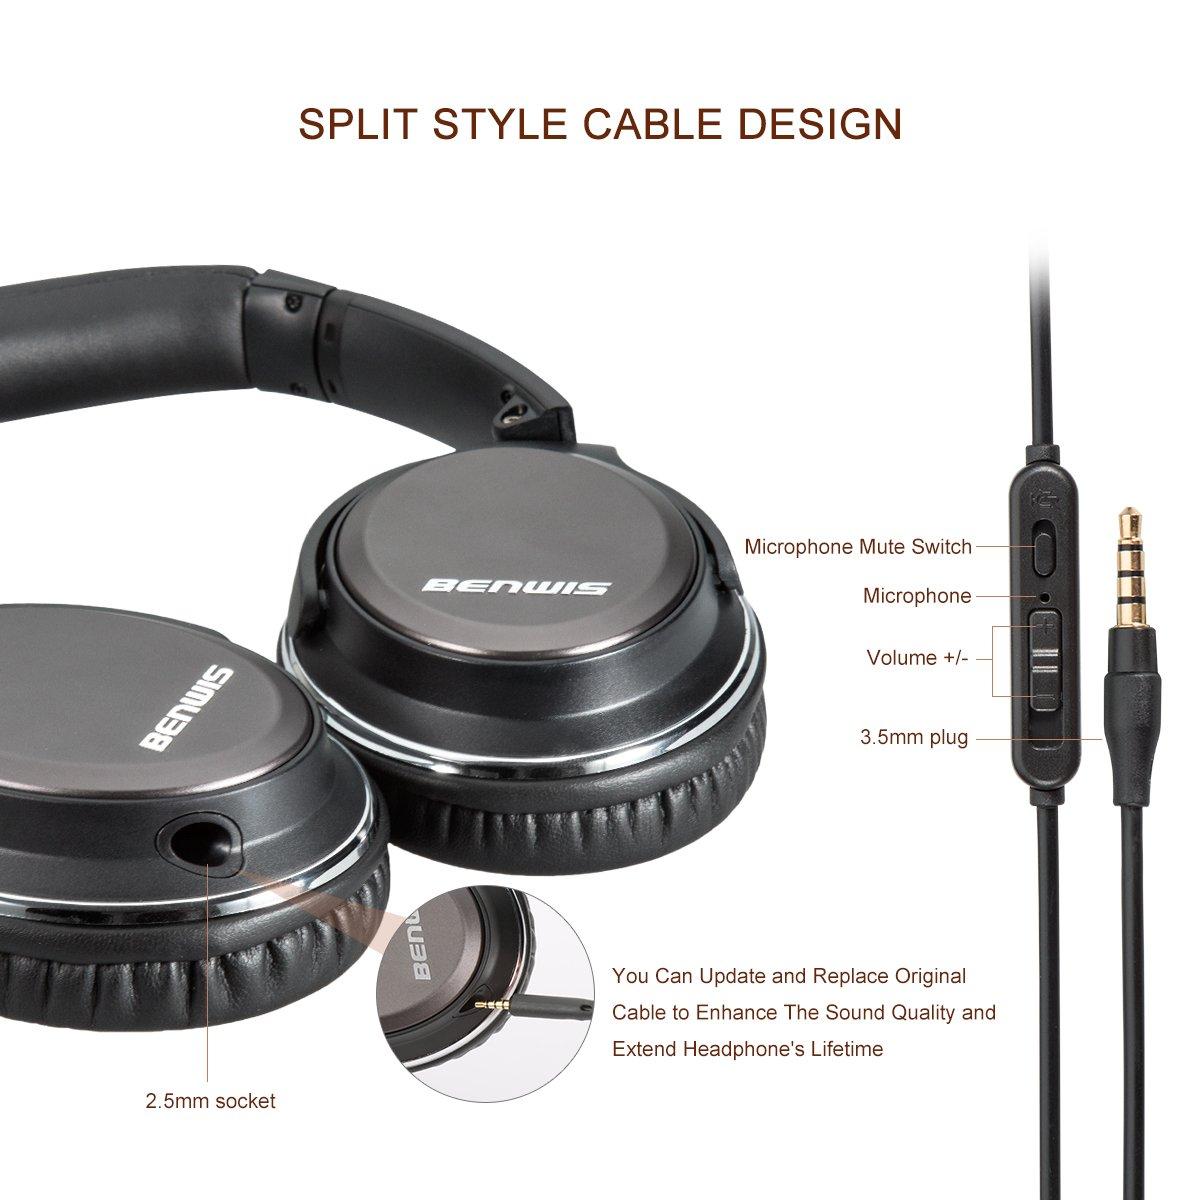 Benwis Wired Computer Headsets, Over Ear Headphones, Lightweight ...